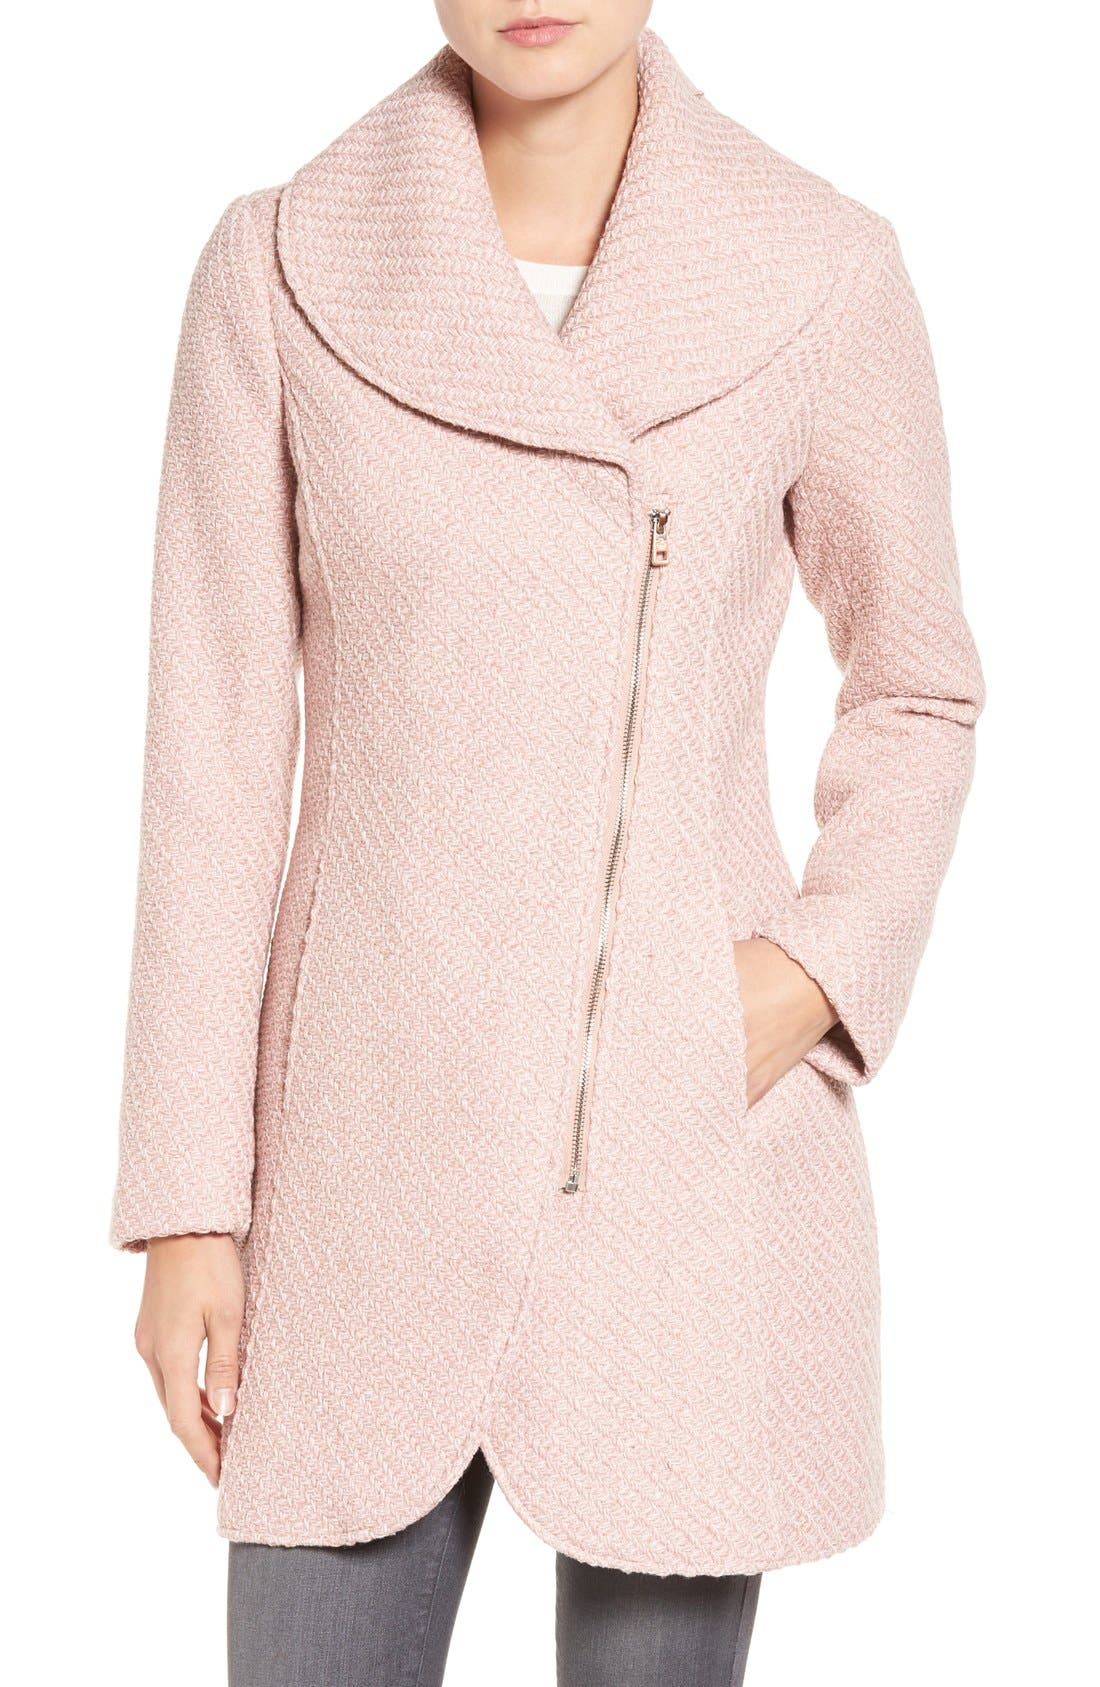 Alternate Image 1 Selected - Jessica Simpson Shawl Collar Coat